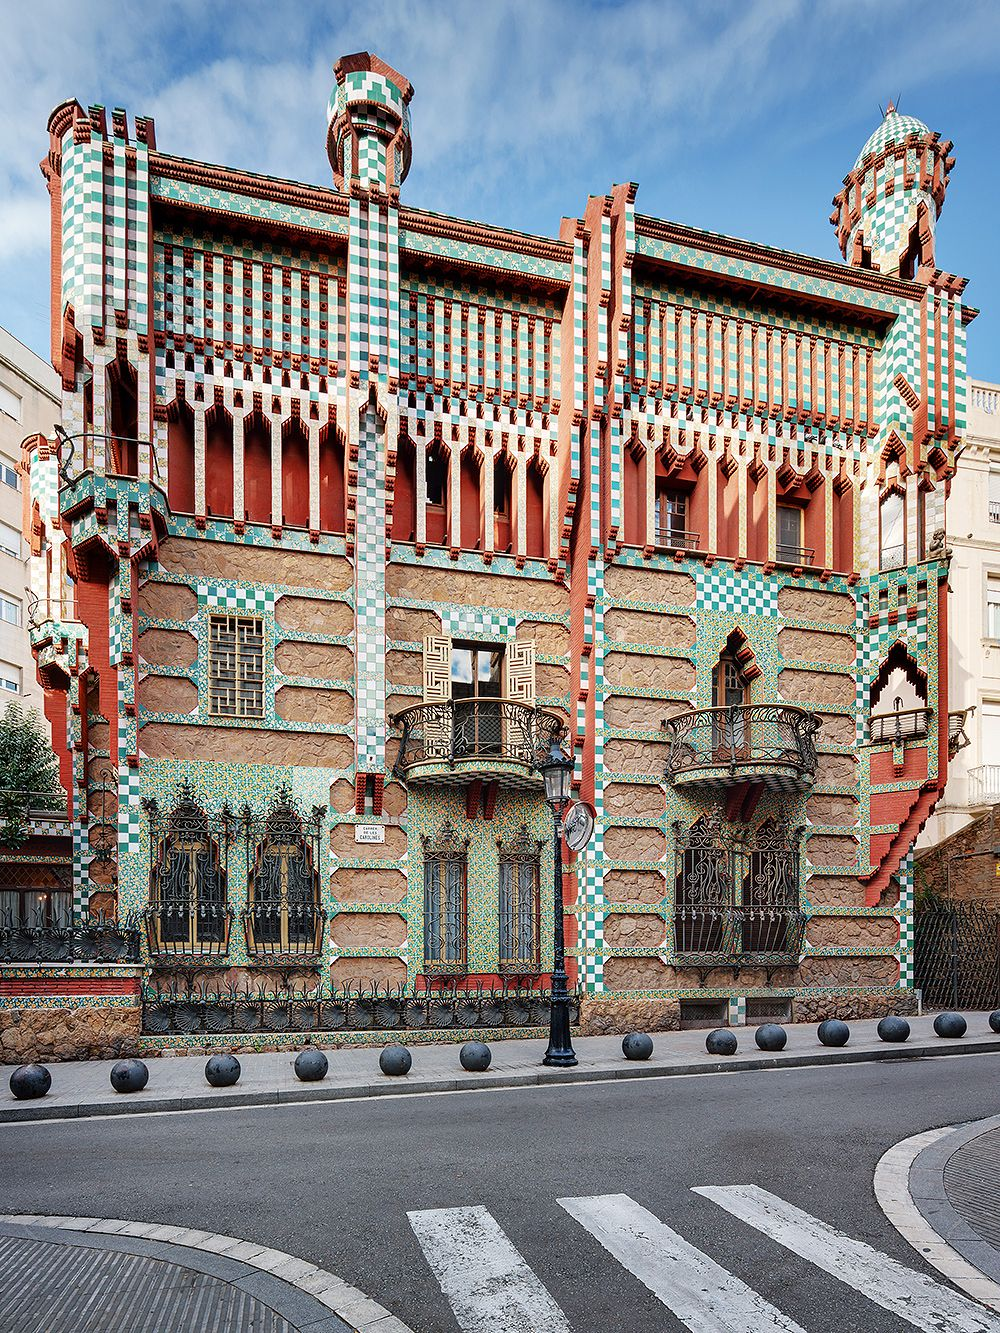 Casa Vicens Antoni Gaudí